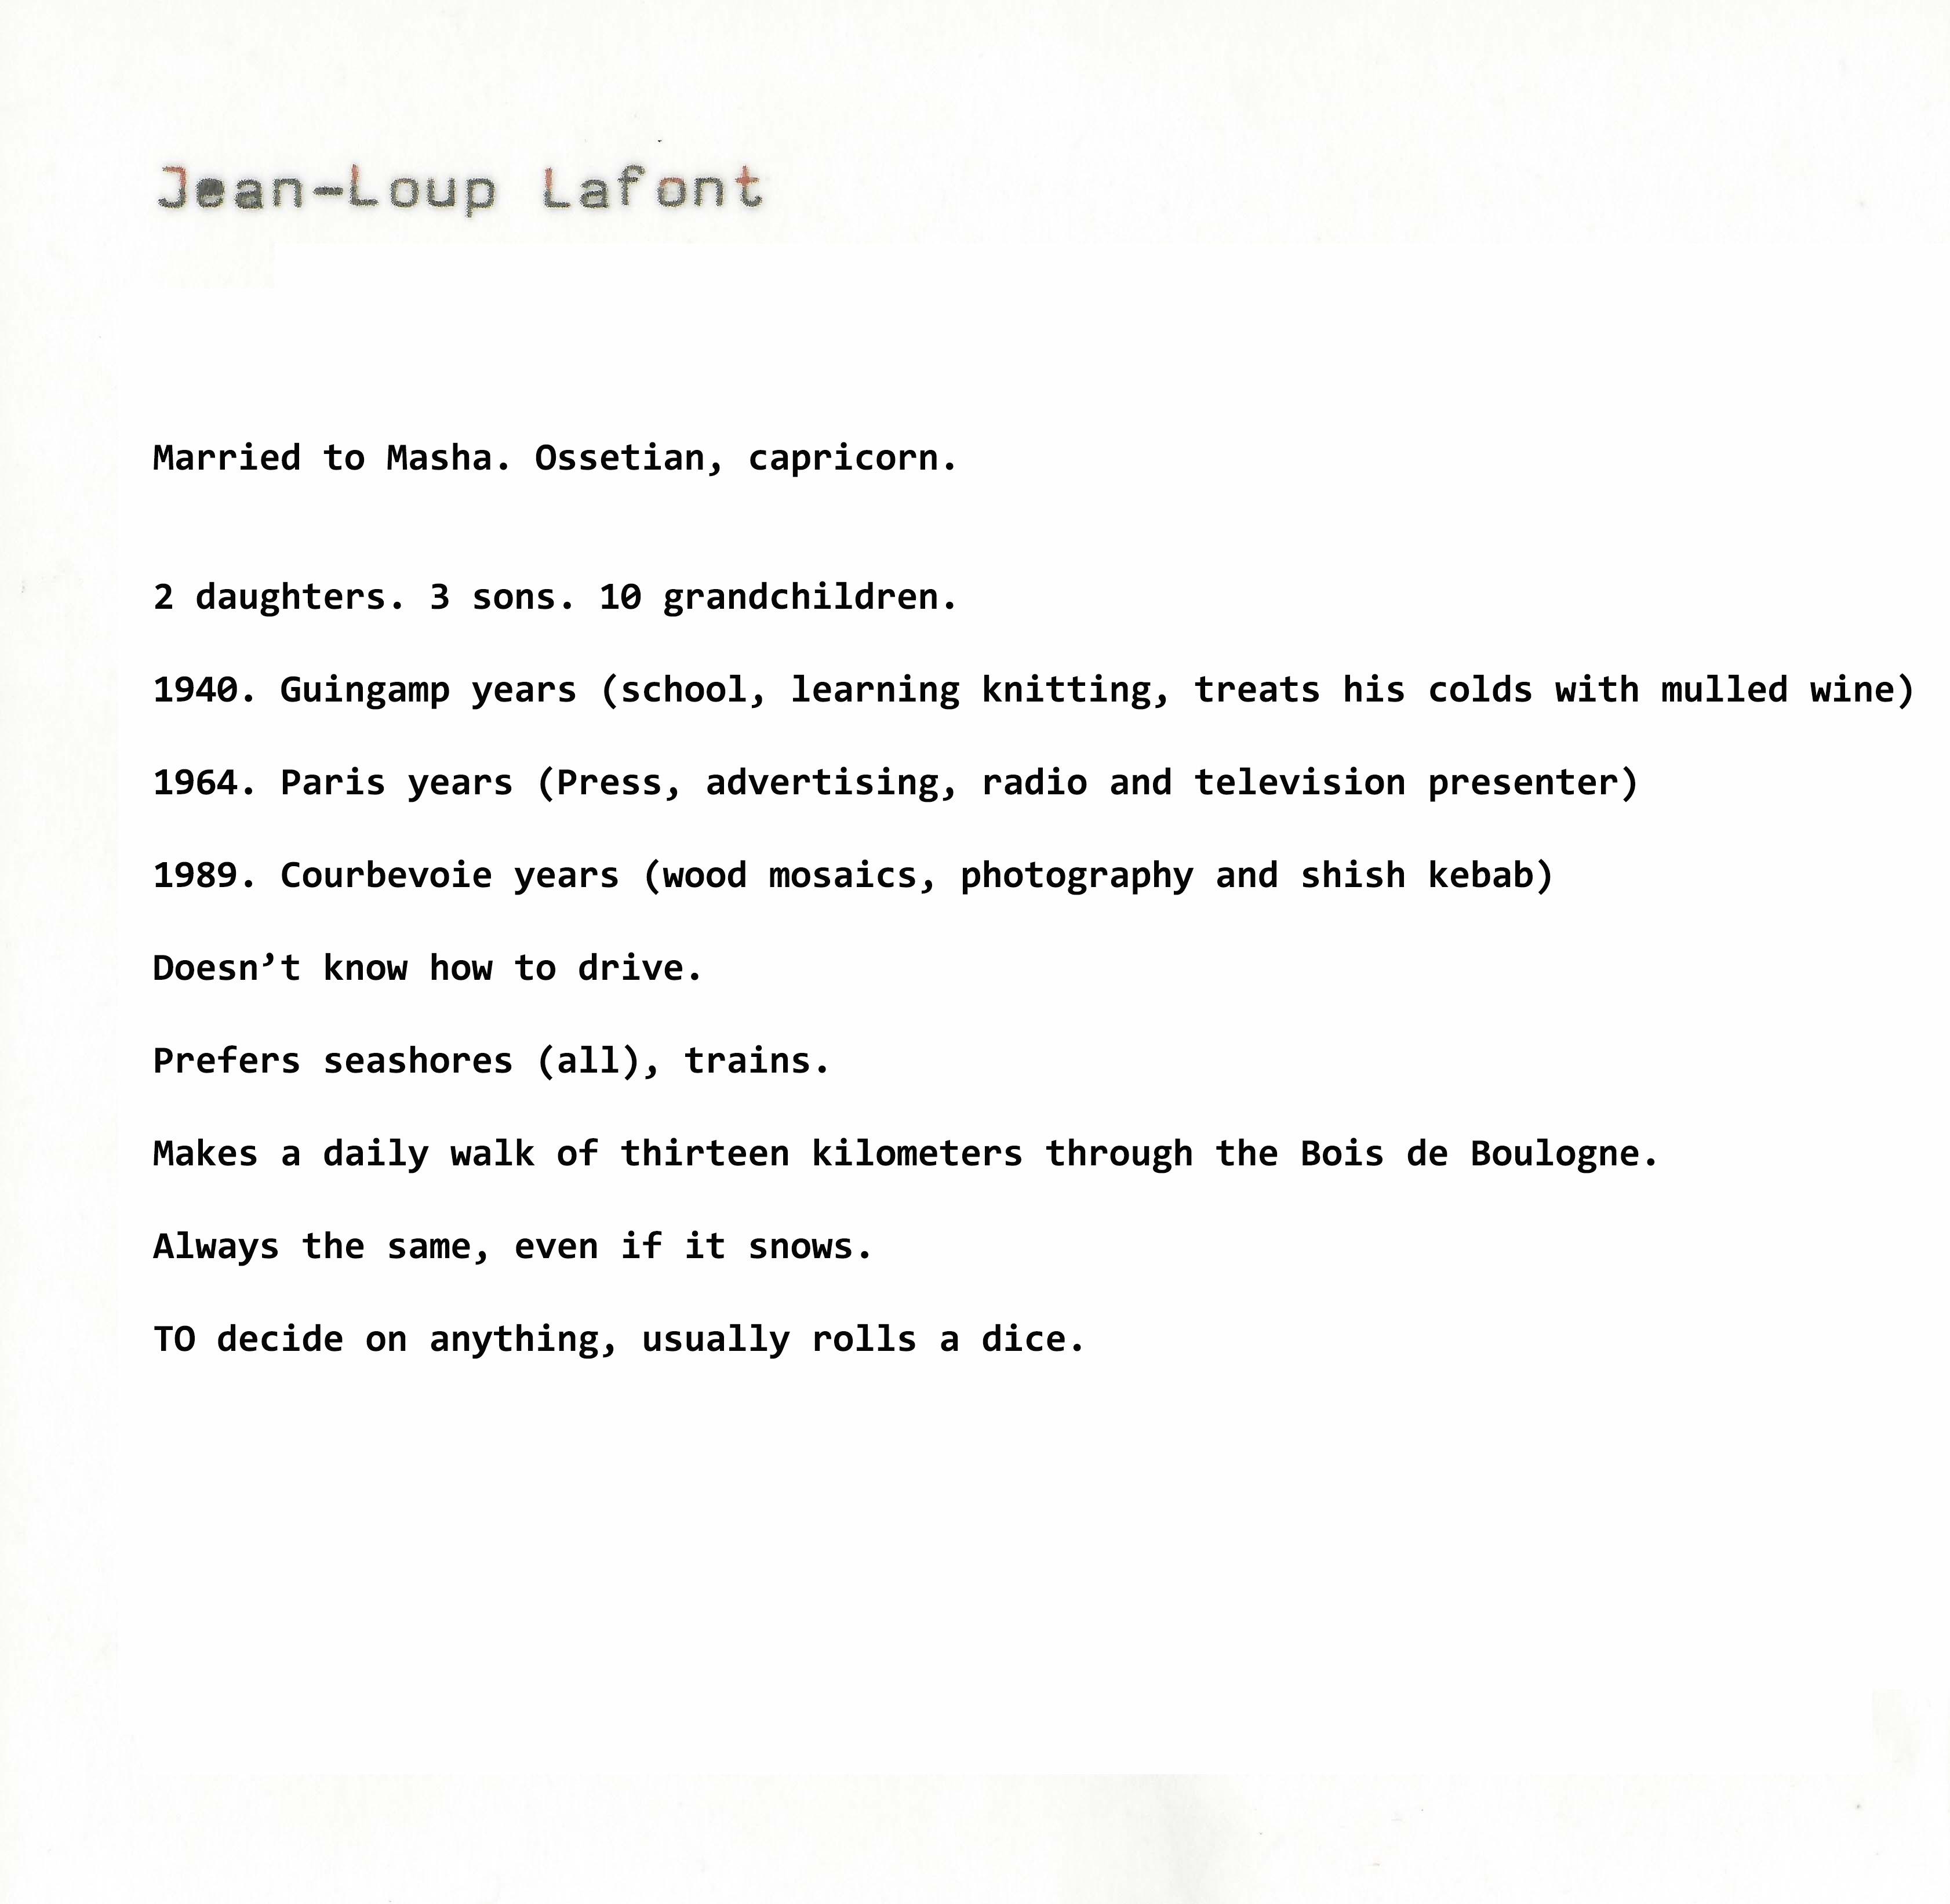 Jean-Loup lafont_English